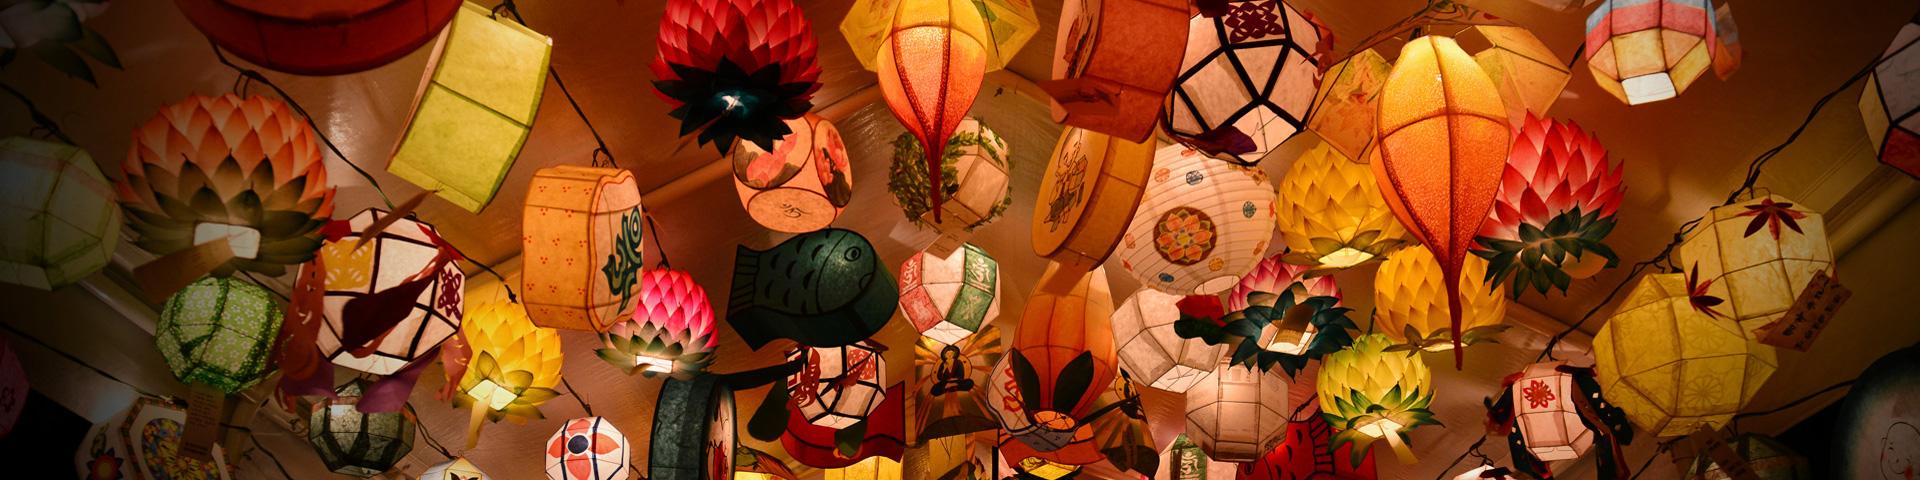 Seoul Lotus lantern festival